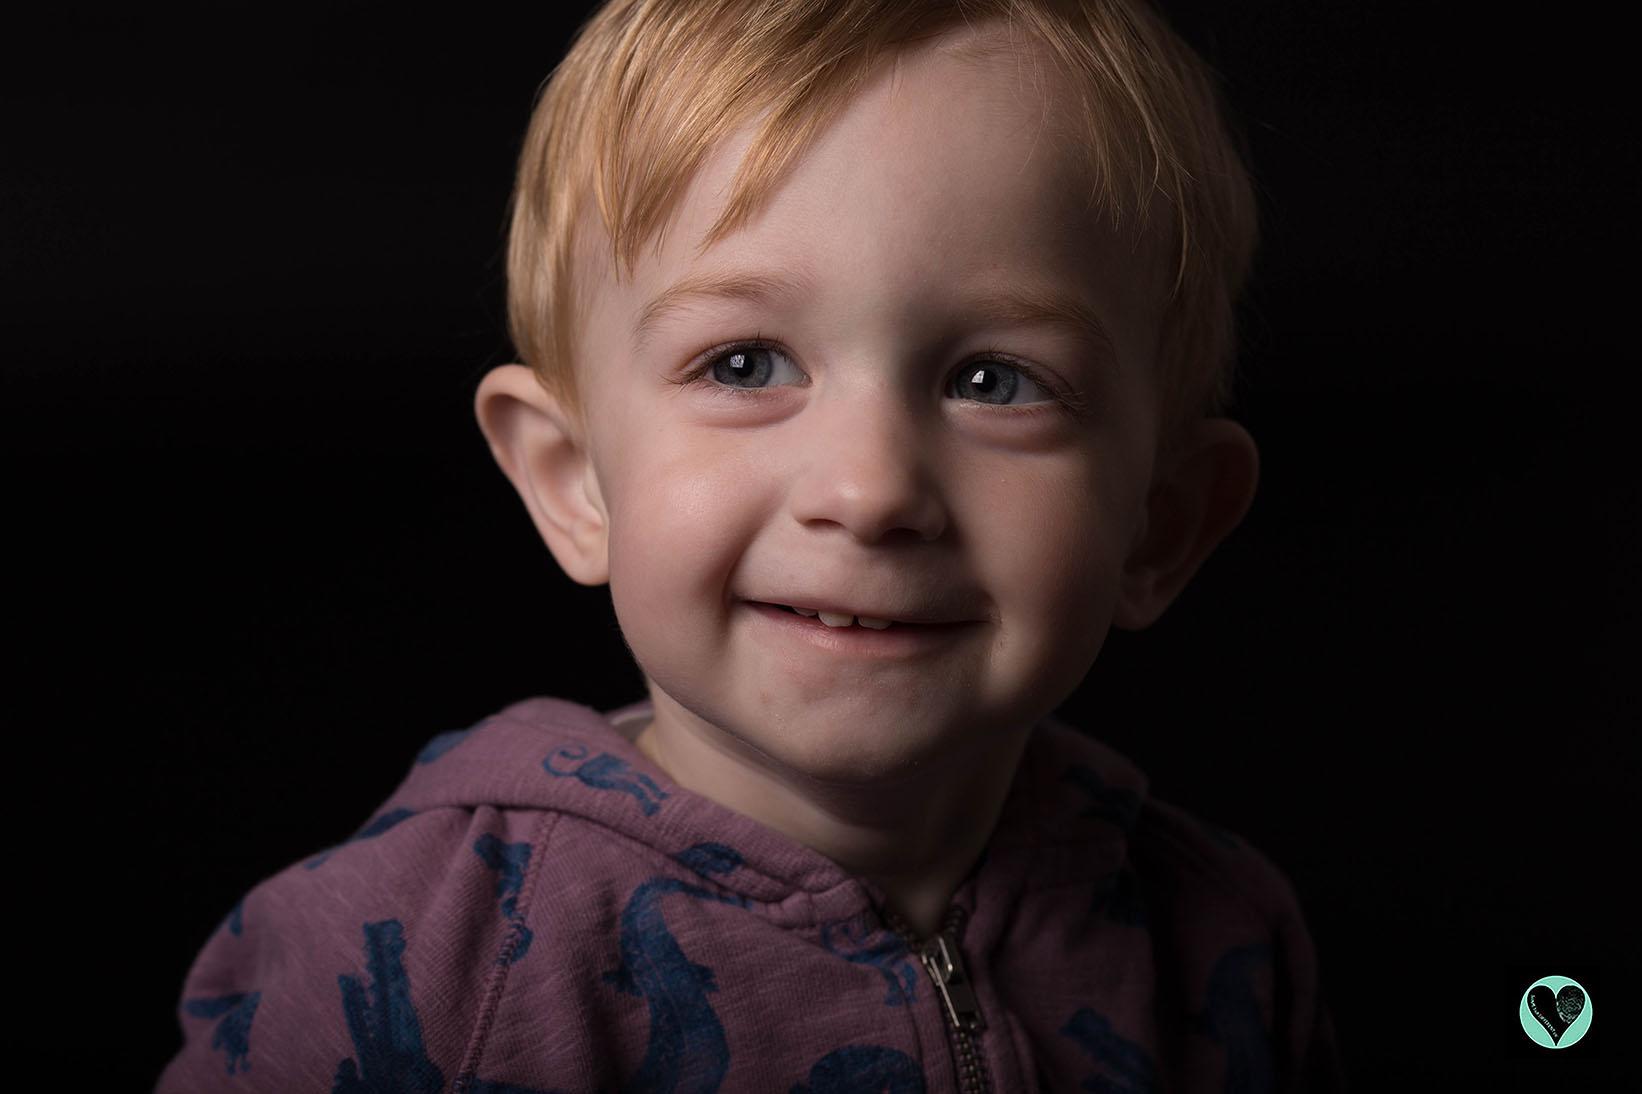 Little boy with hypophosphotasia (HPP)